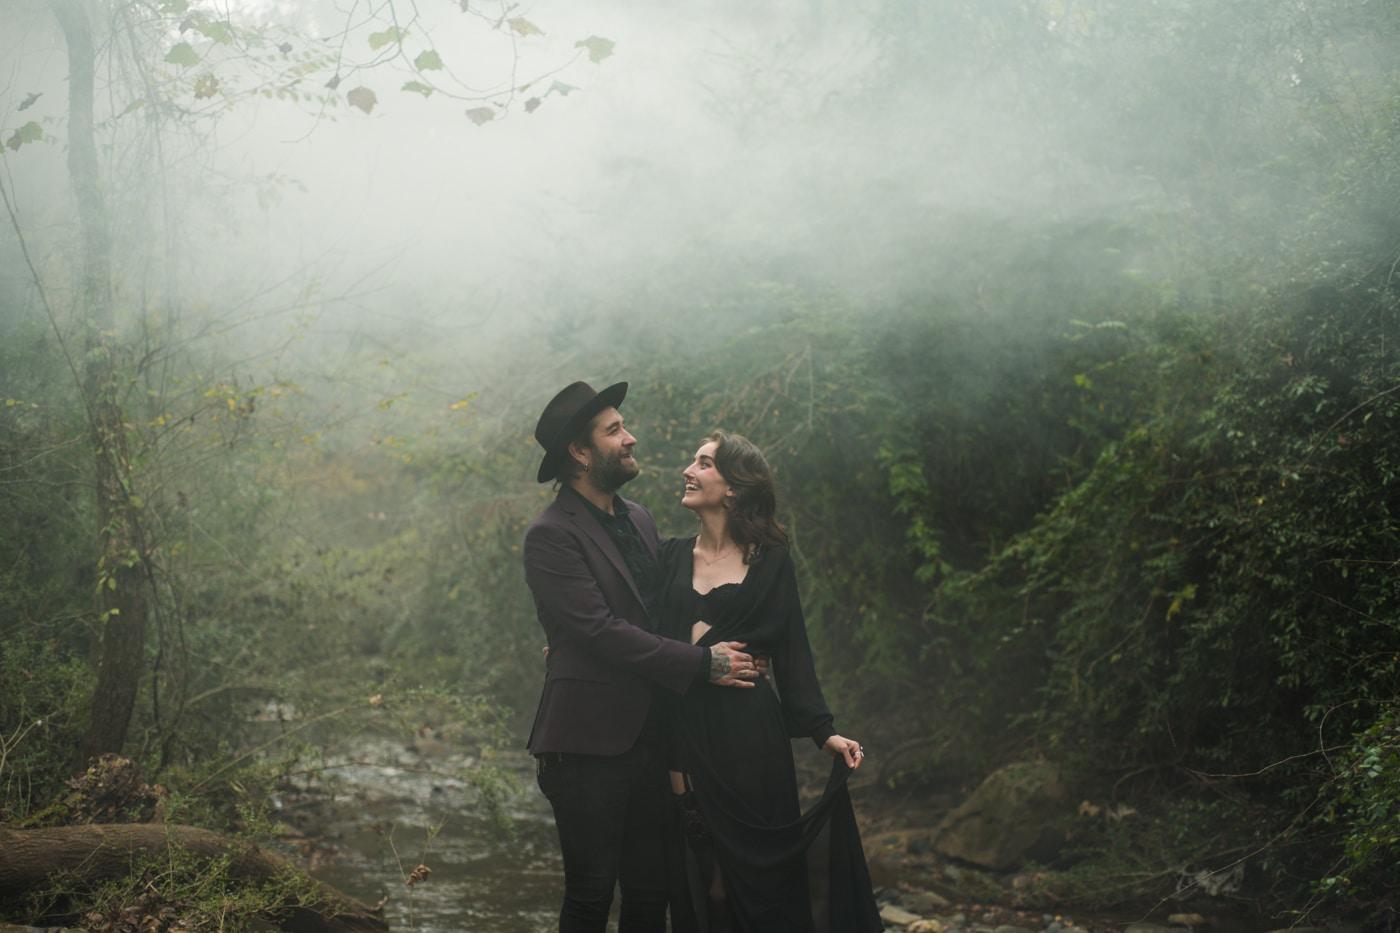 couple walks through backyard with smoke haze